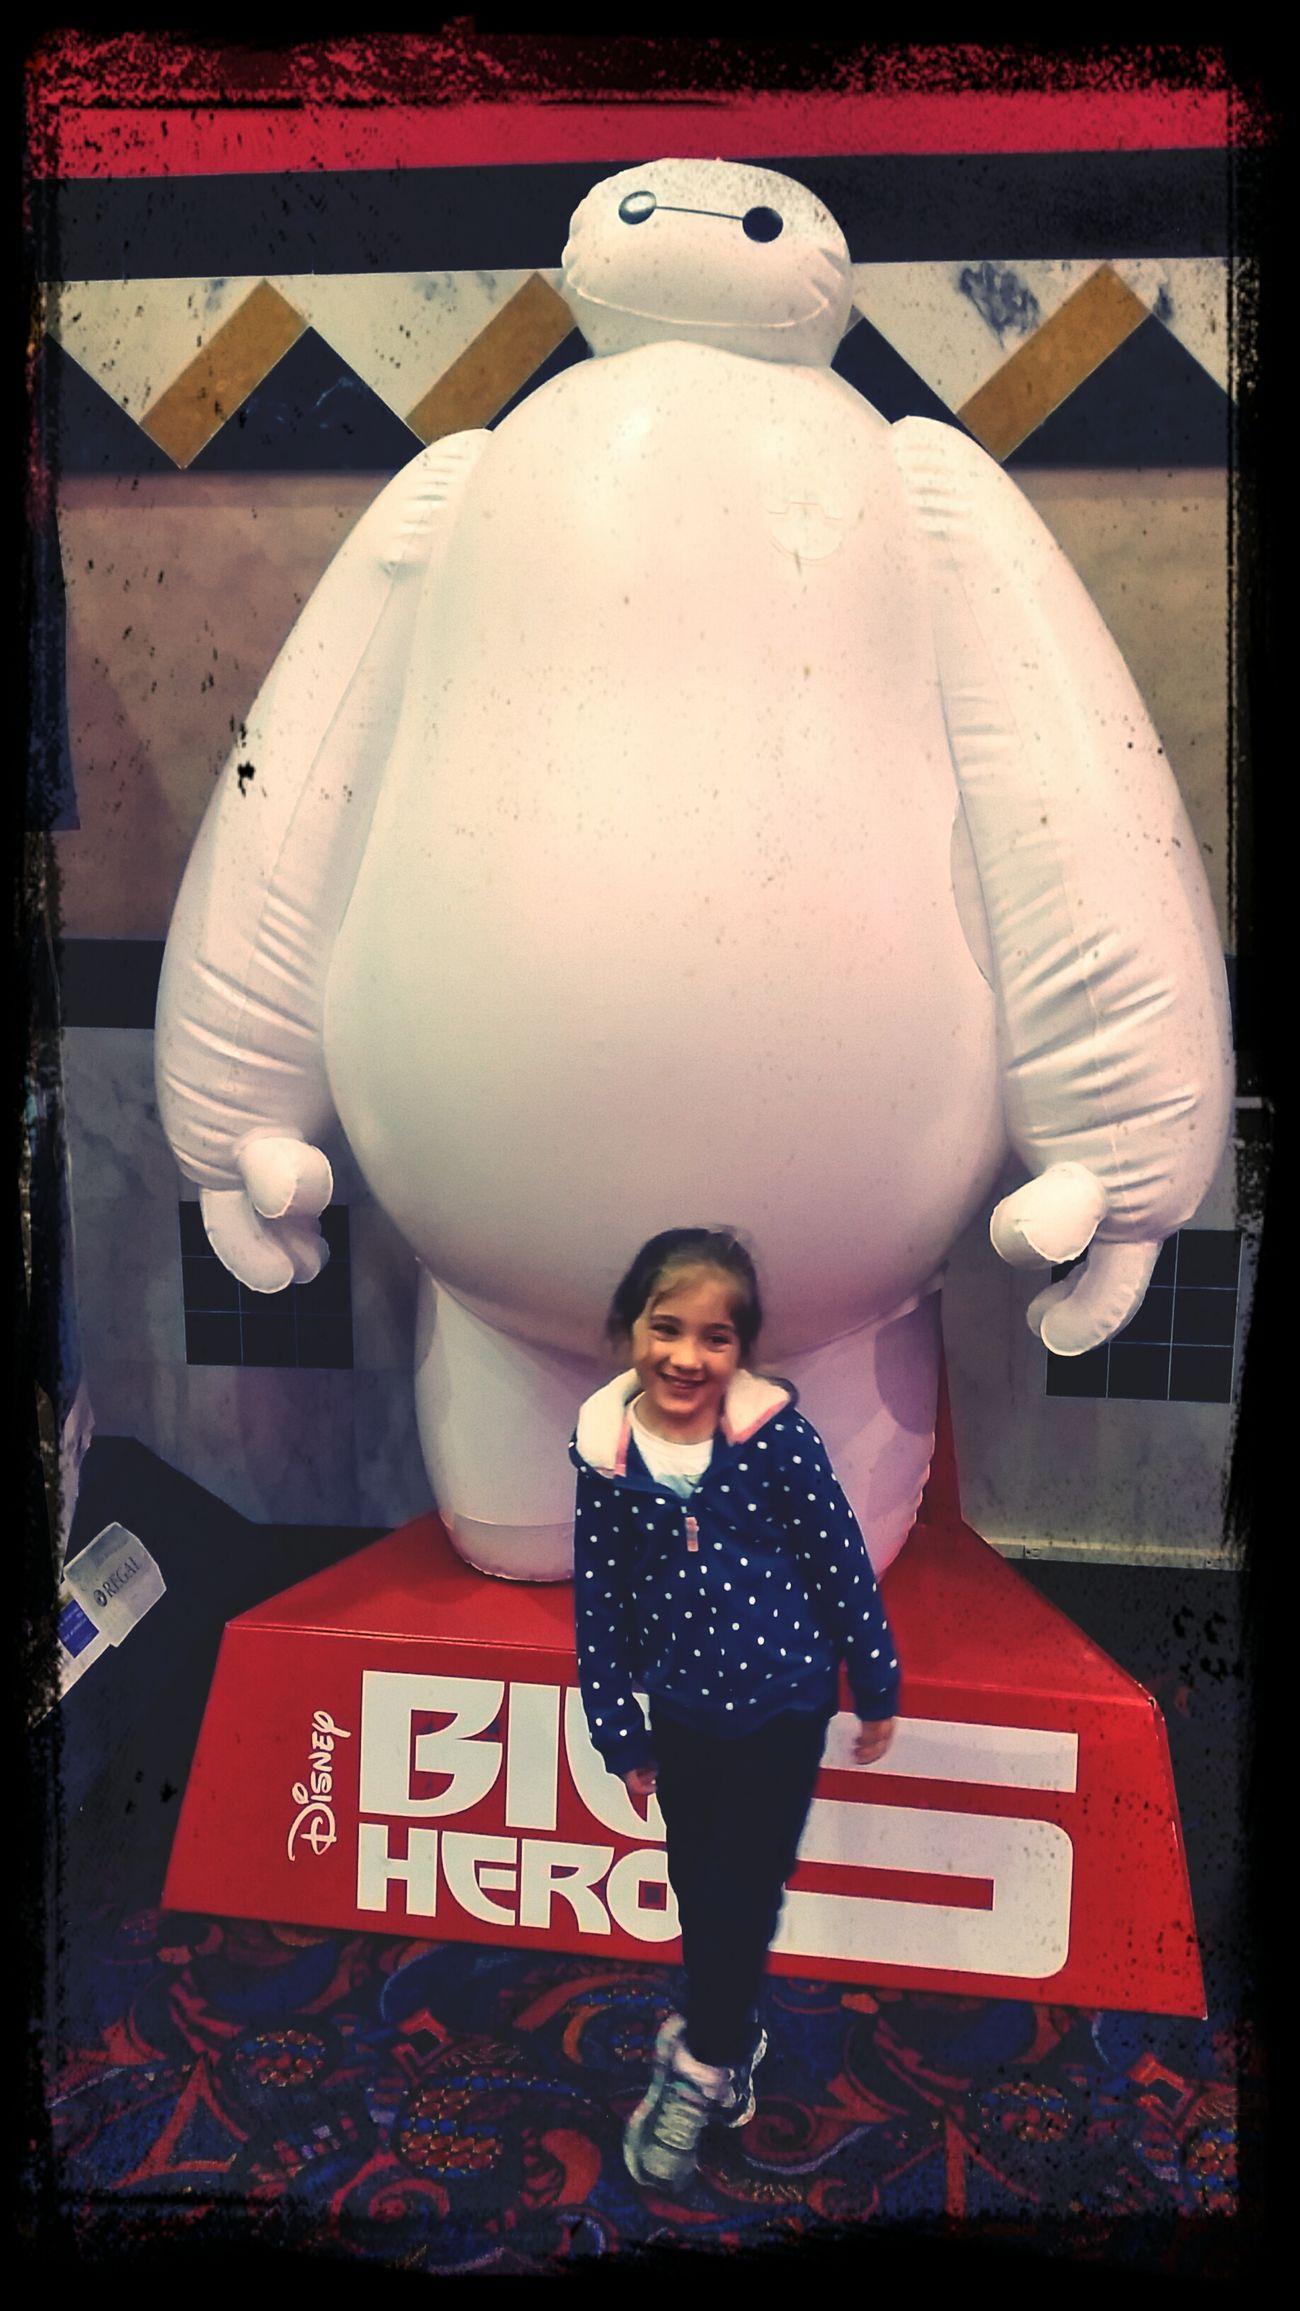 Saw Big Hero 6 list night with my little princess.